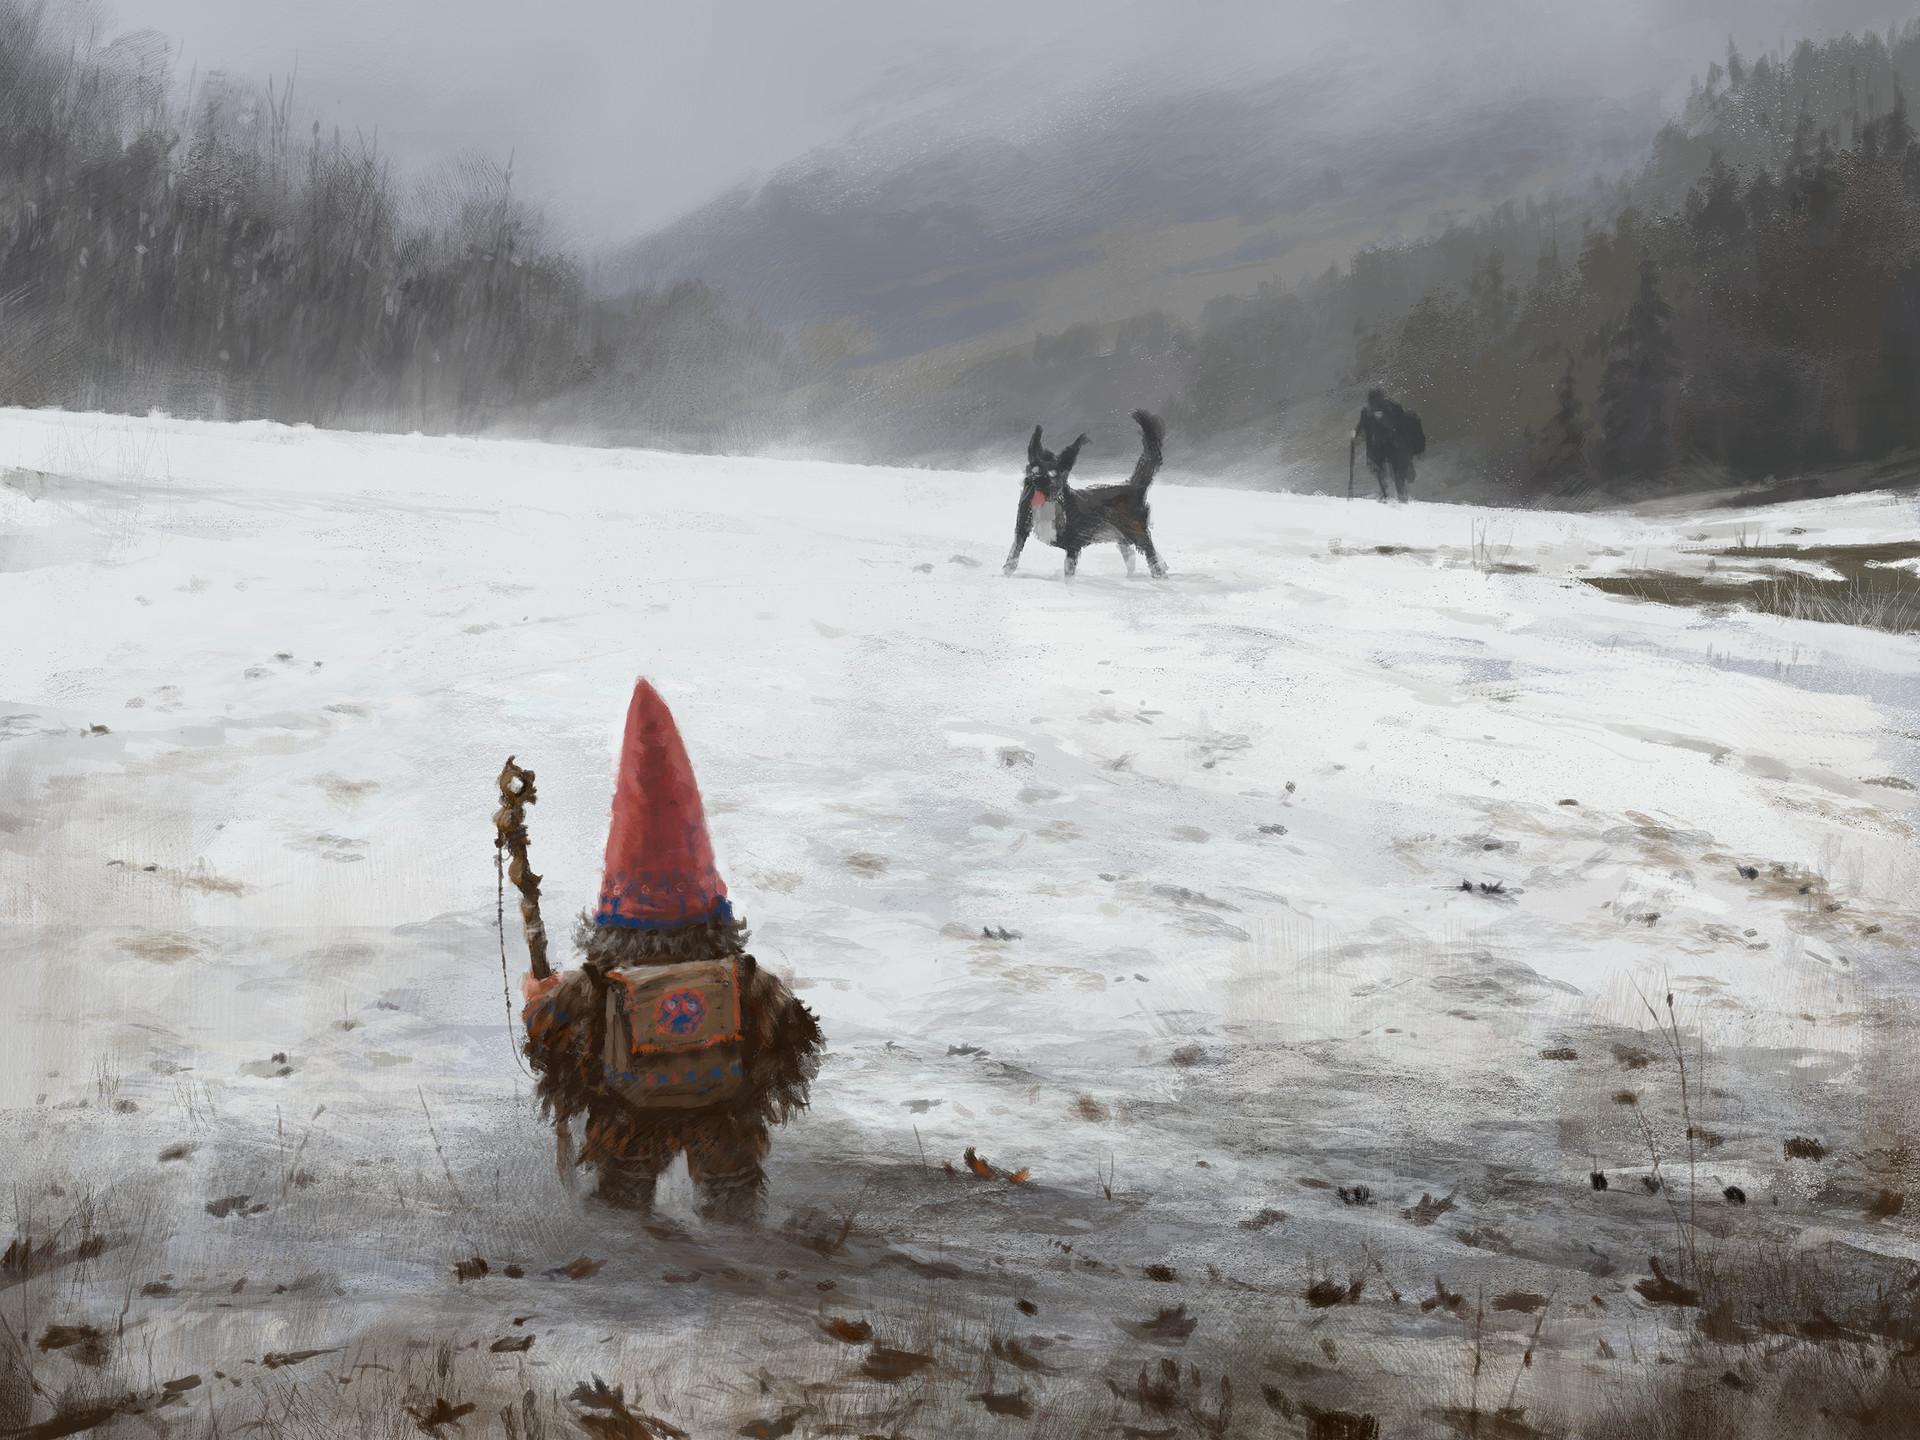 Gnome Animated Wallpaper Jakub Rozalski Wanderer